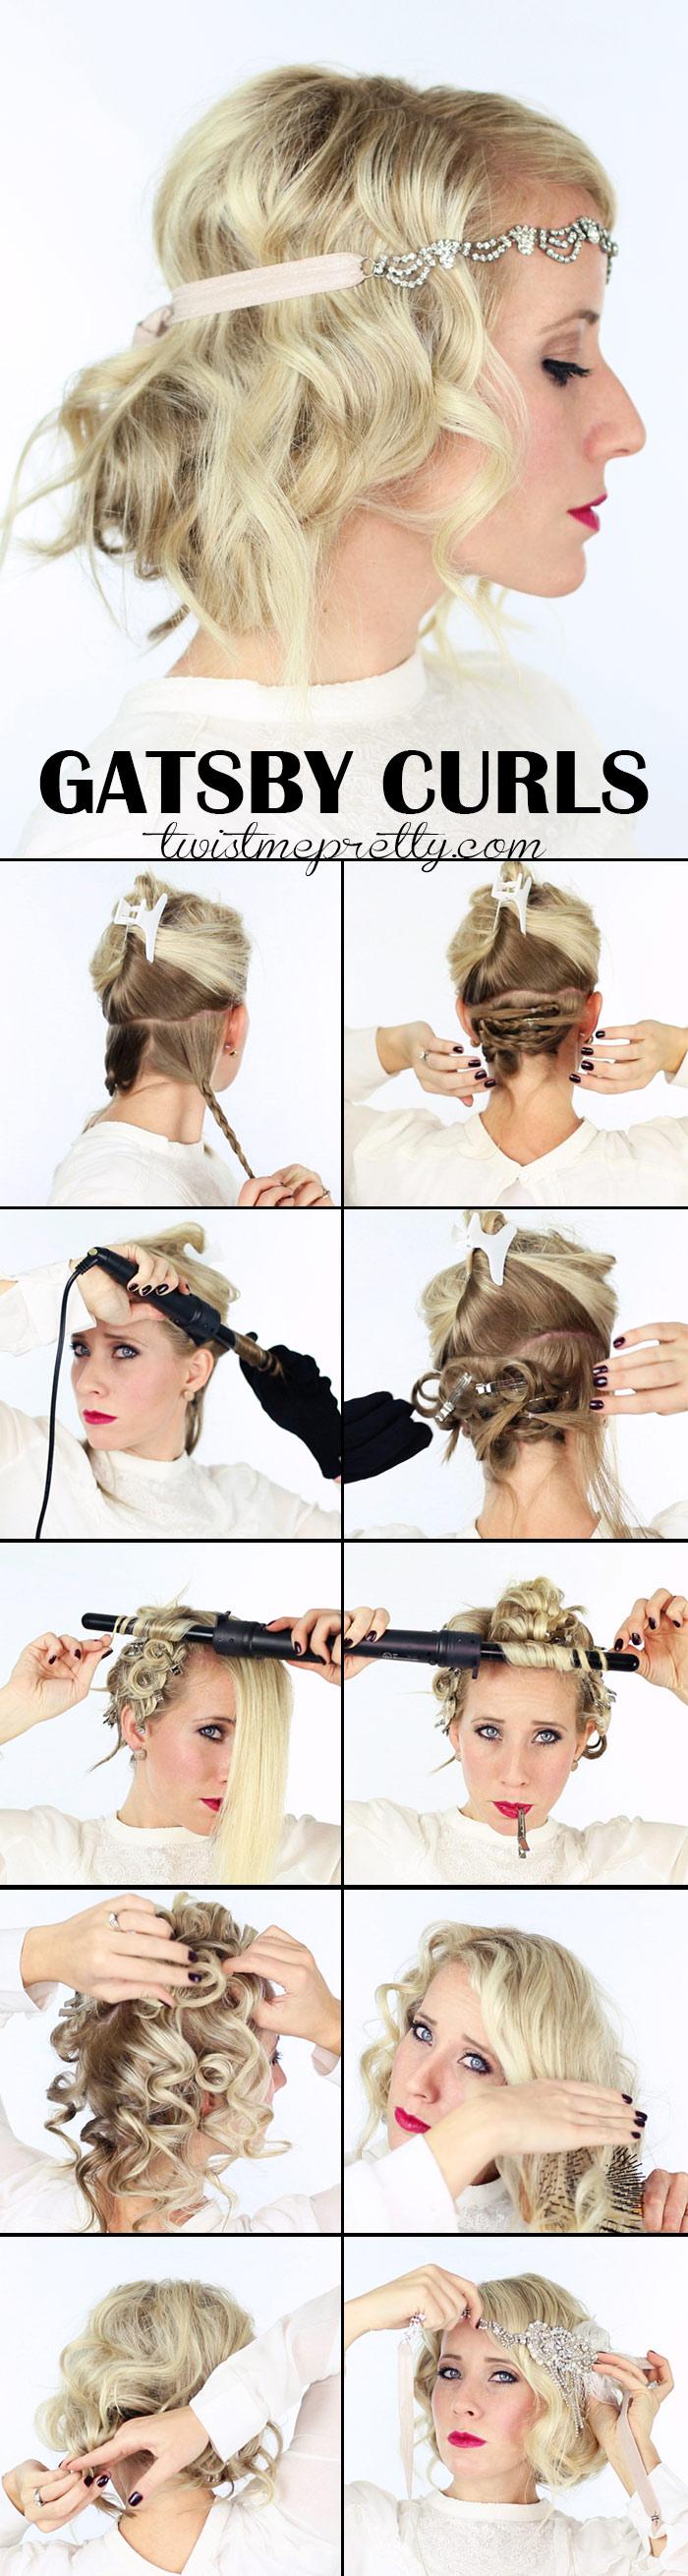 gatsby hairstyles